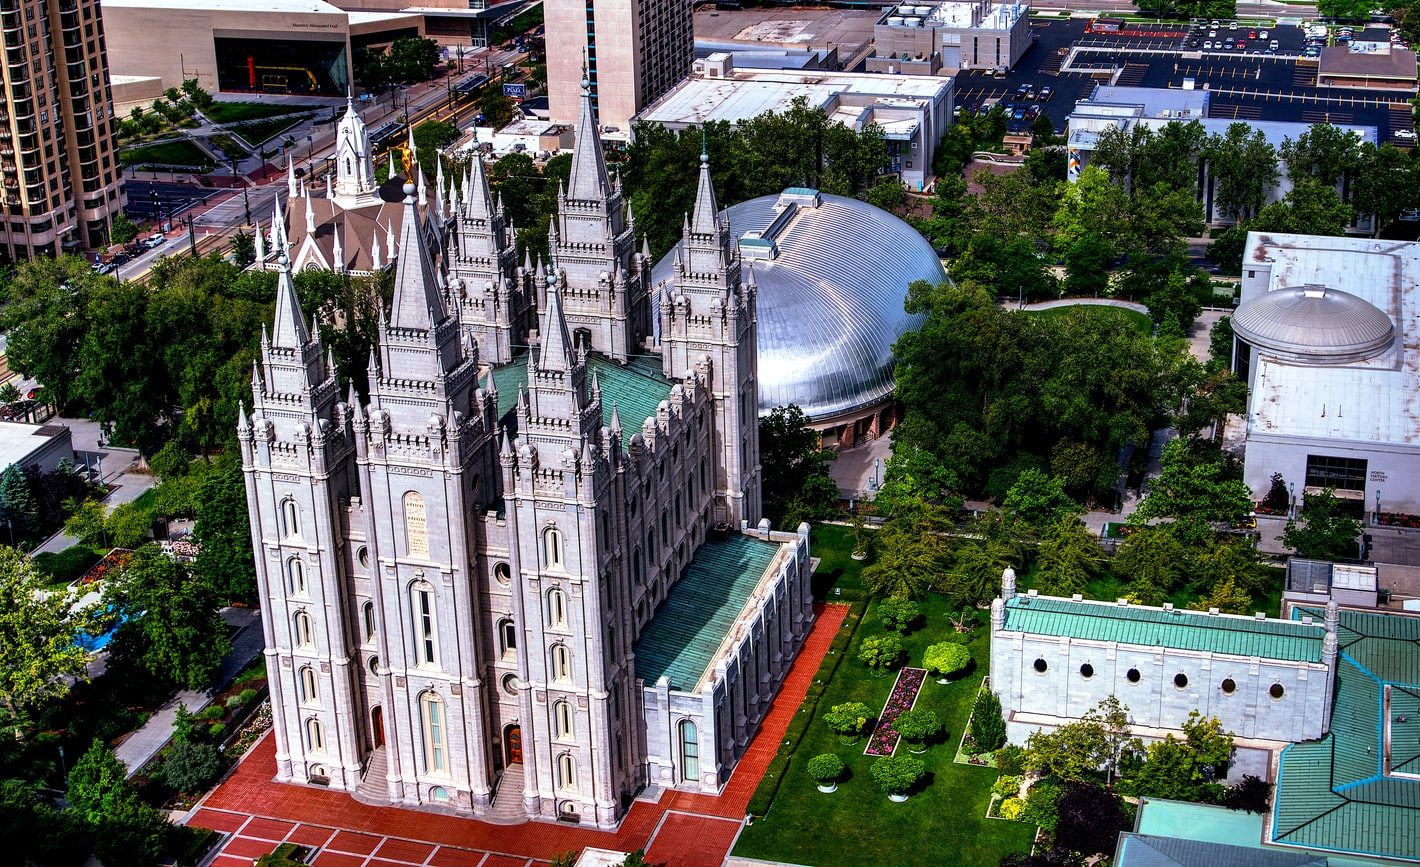 The Best Areas to Stay in Salt Lake City, Utah